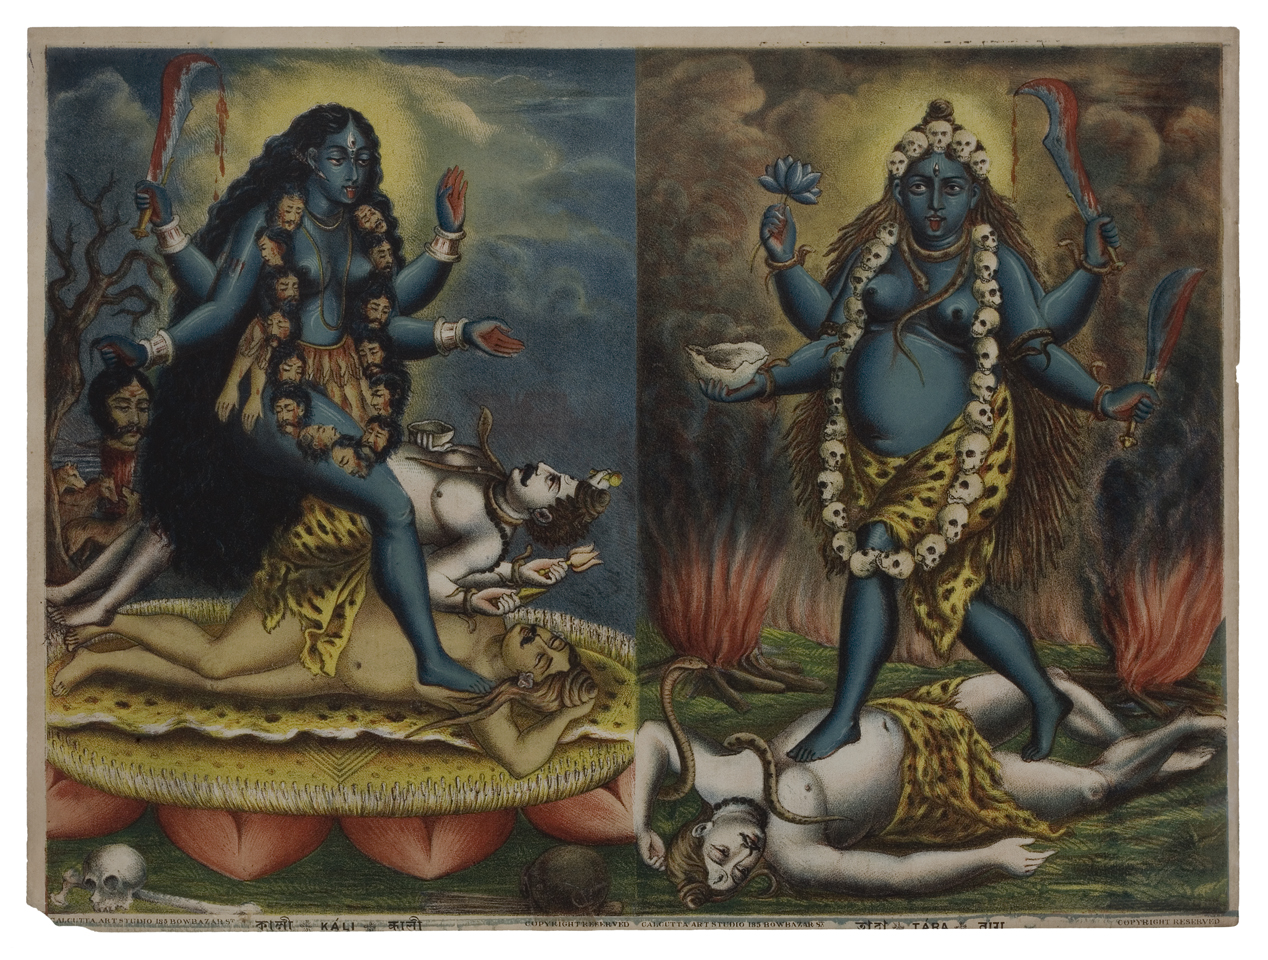 Kali / Tara, c. 1885